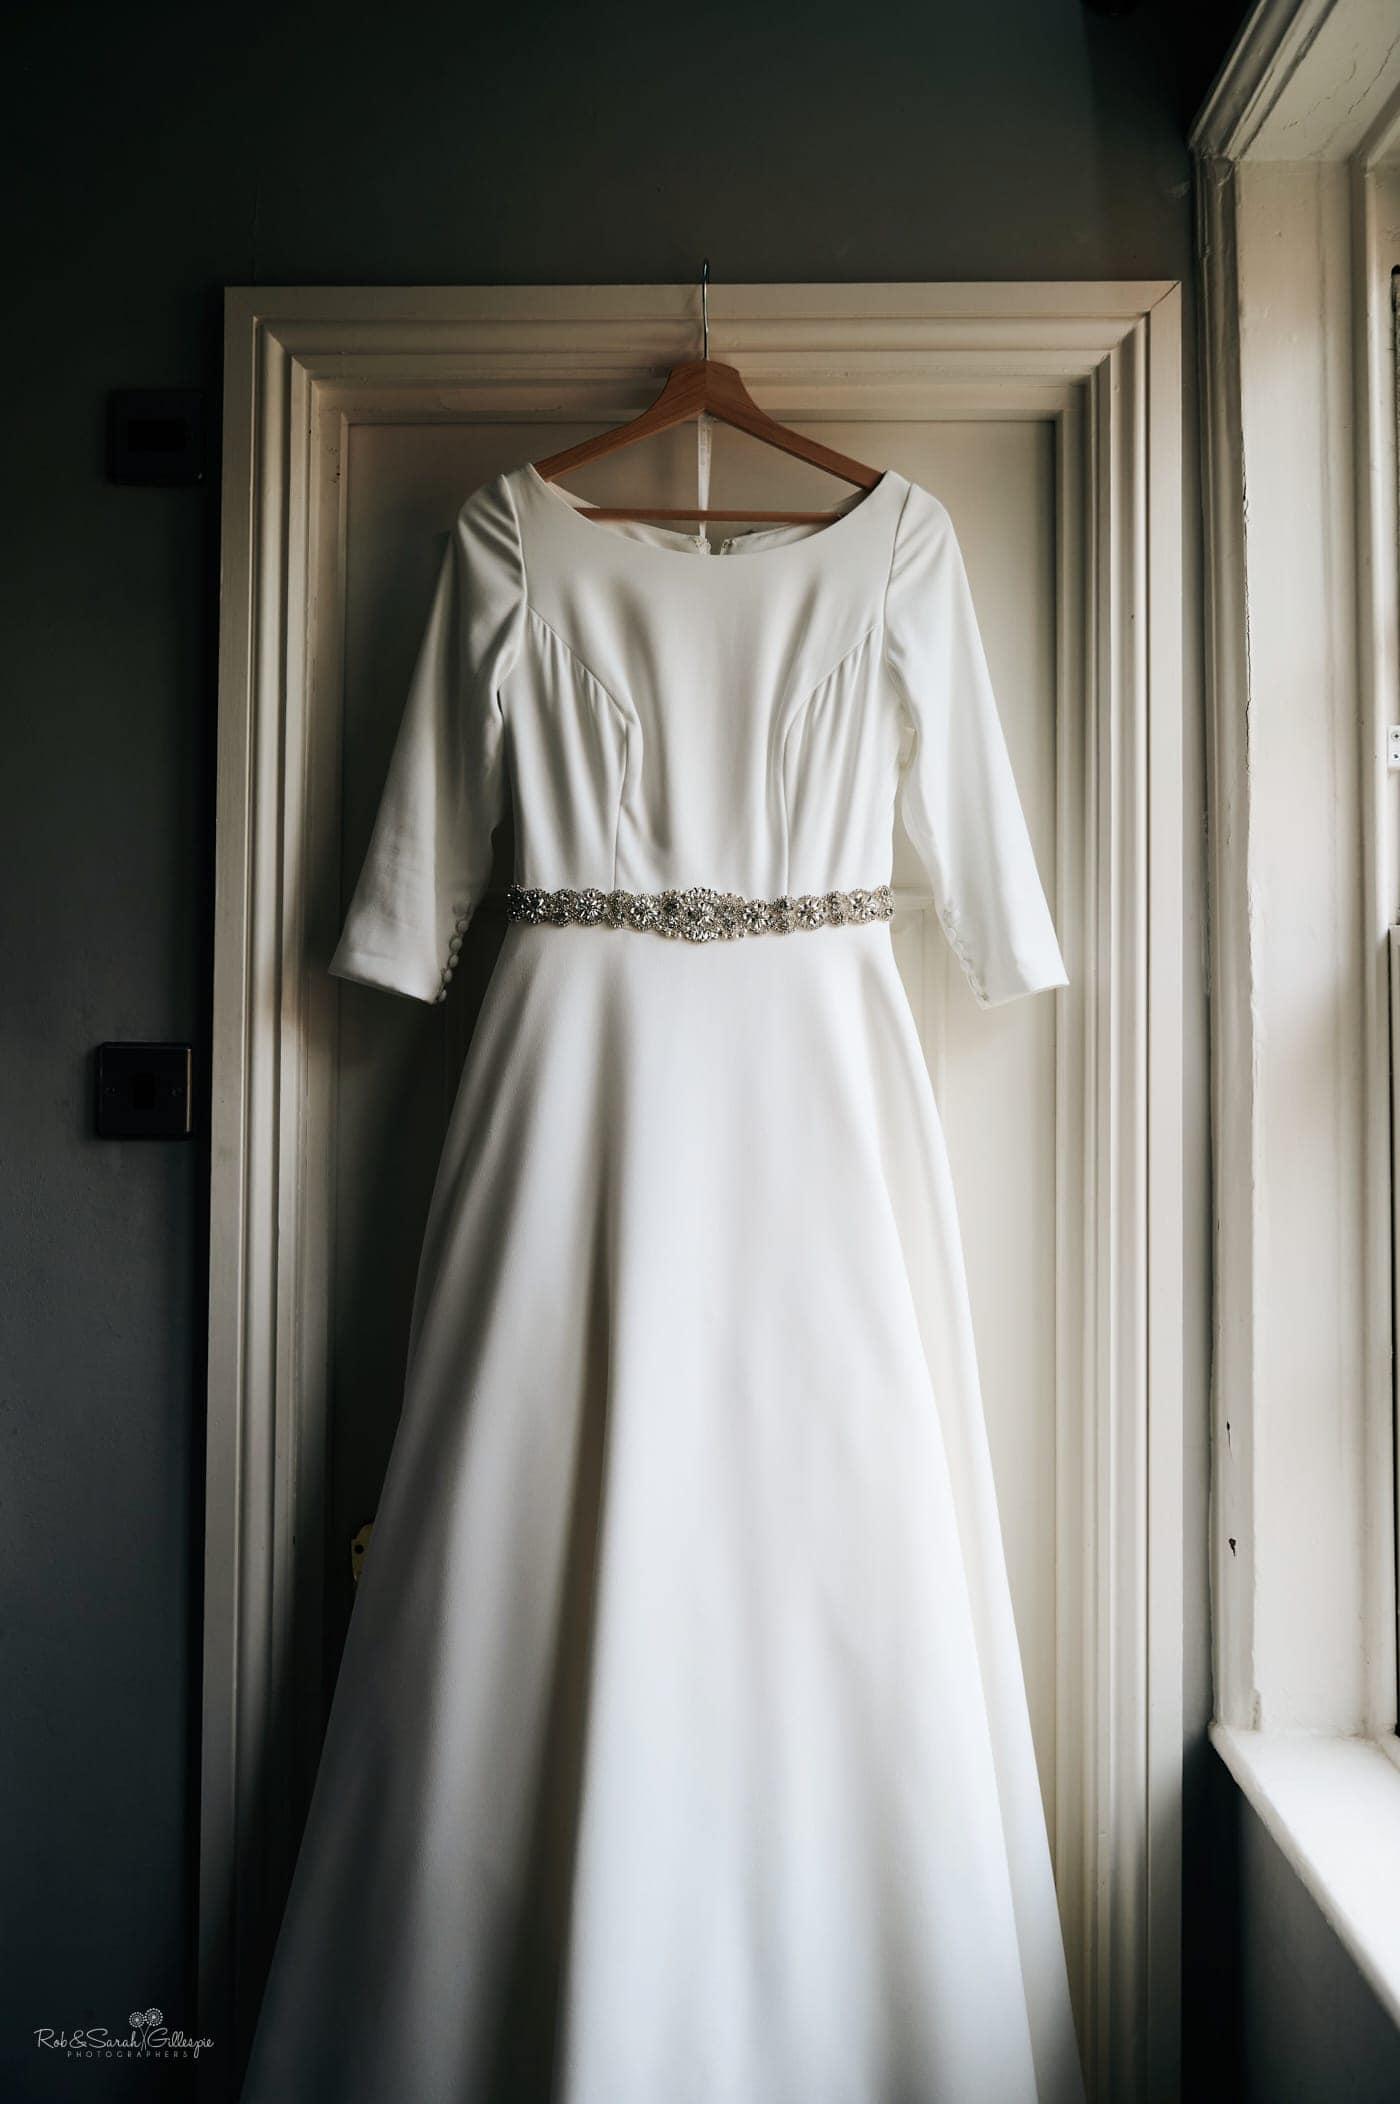 Wedding dress hanging up on doorframe in beautiful window light